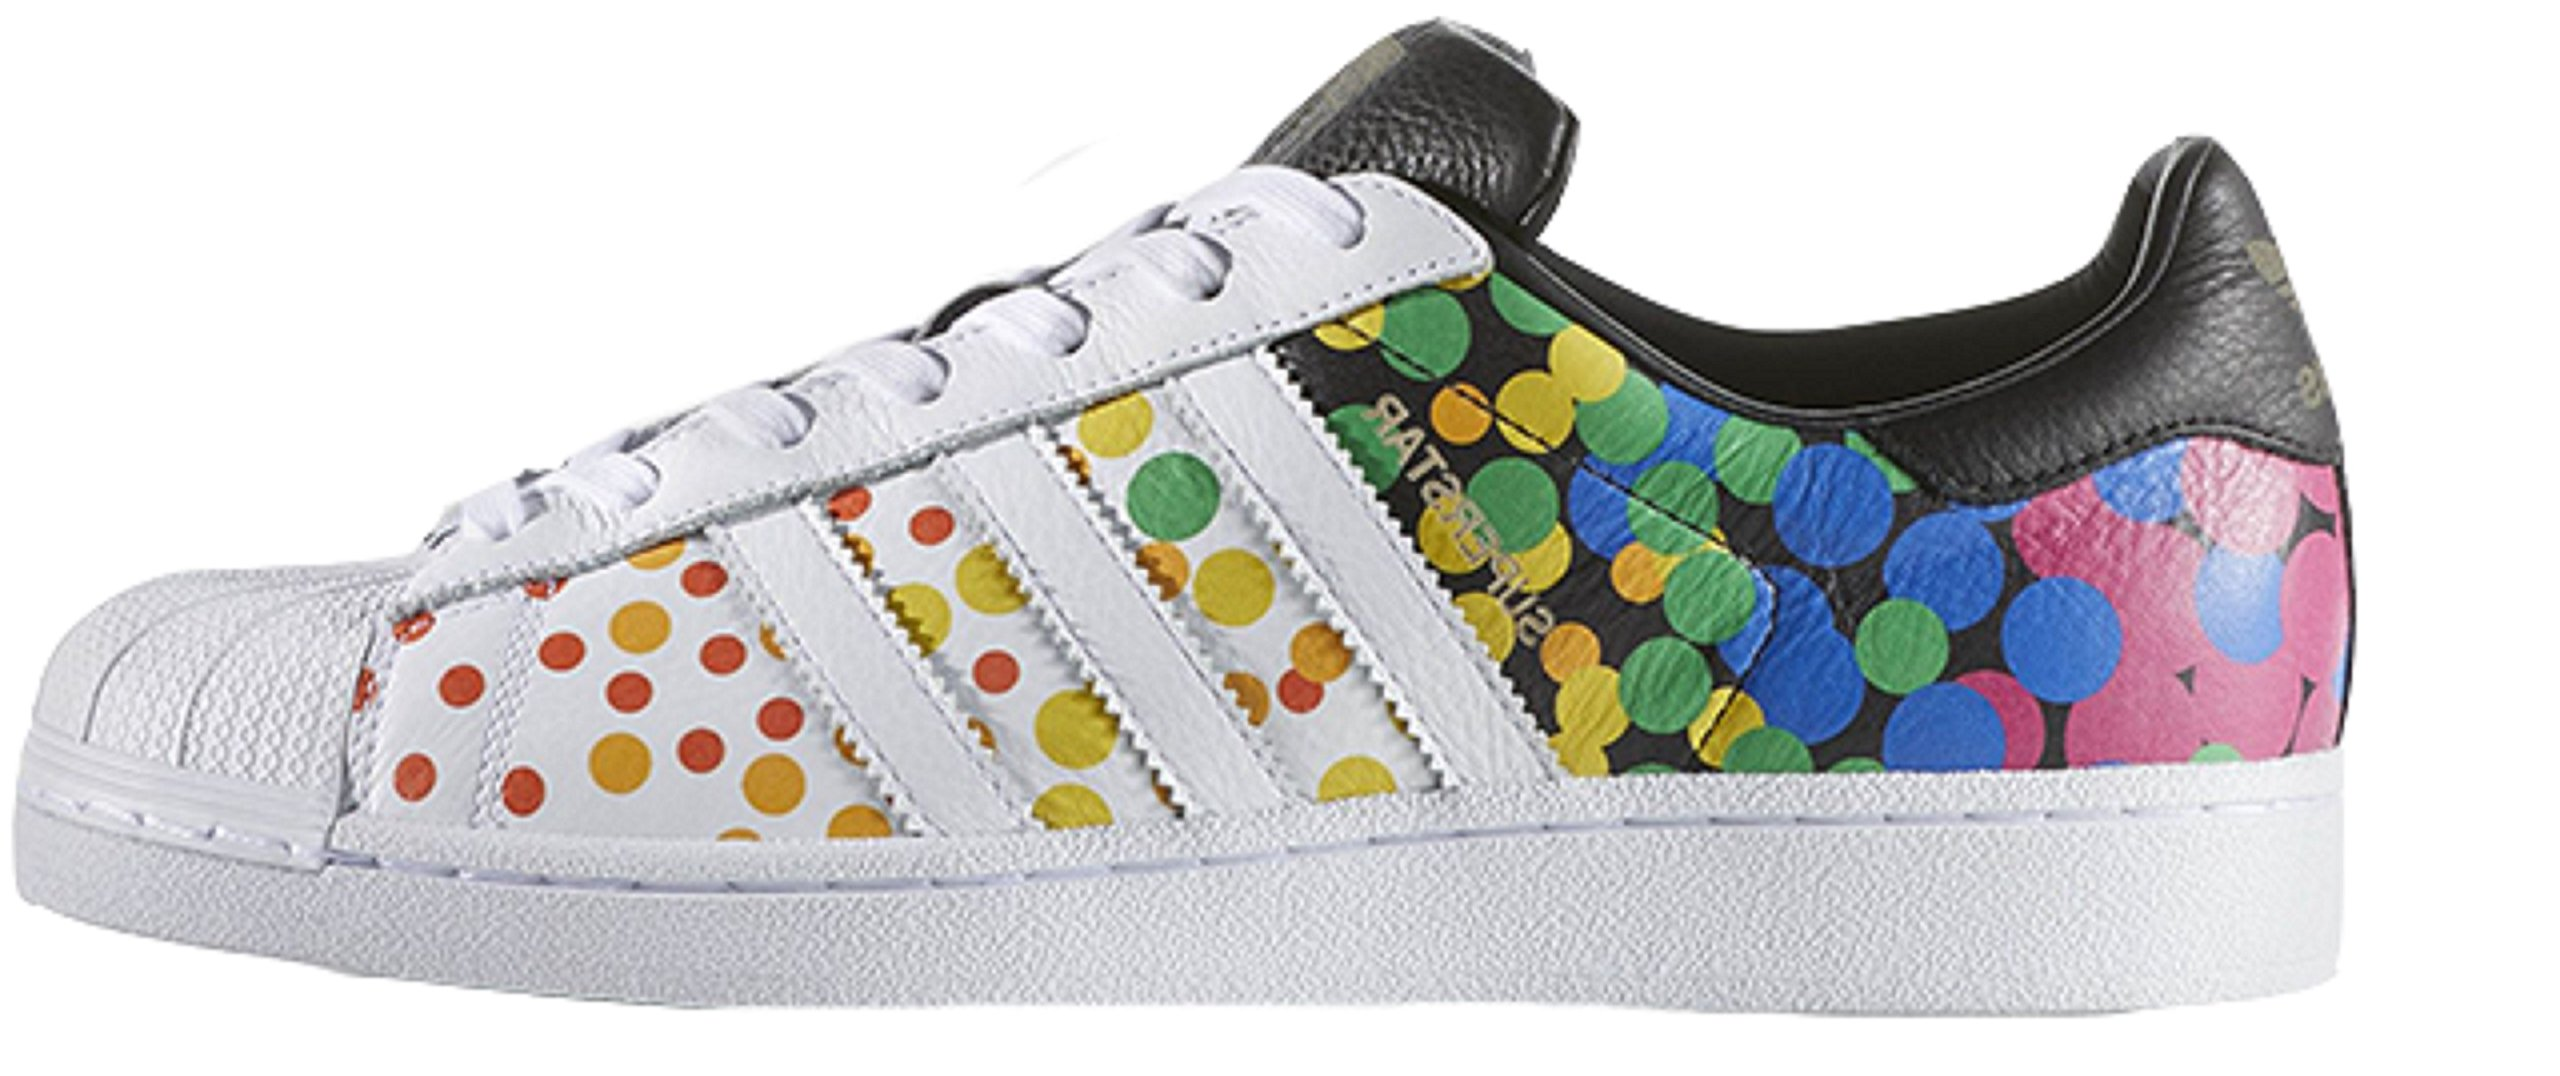 adidas Originals Men's Superstar Casual Fashion Sneaker, LGBTQ Pride White 11.5 D(M) US